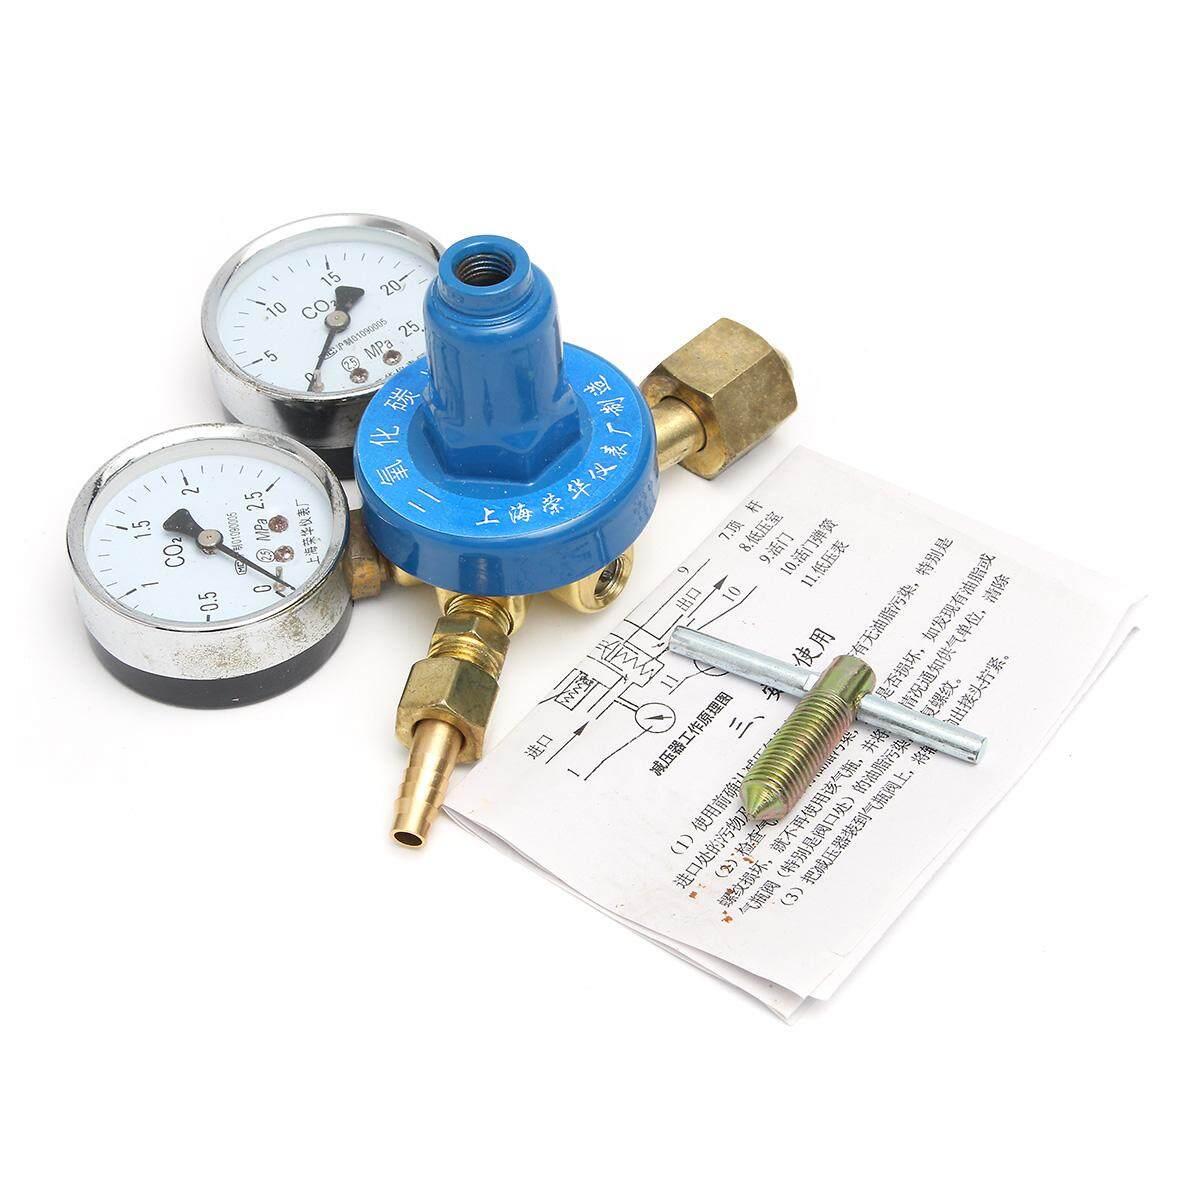 15mpa Co2 ทองเหลือง Mig Welding Regulator G5/8 สำหรับผับขวดแก๊สหญิงด้าย By Moonbeam.